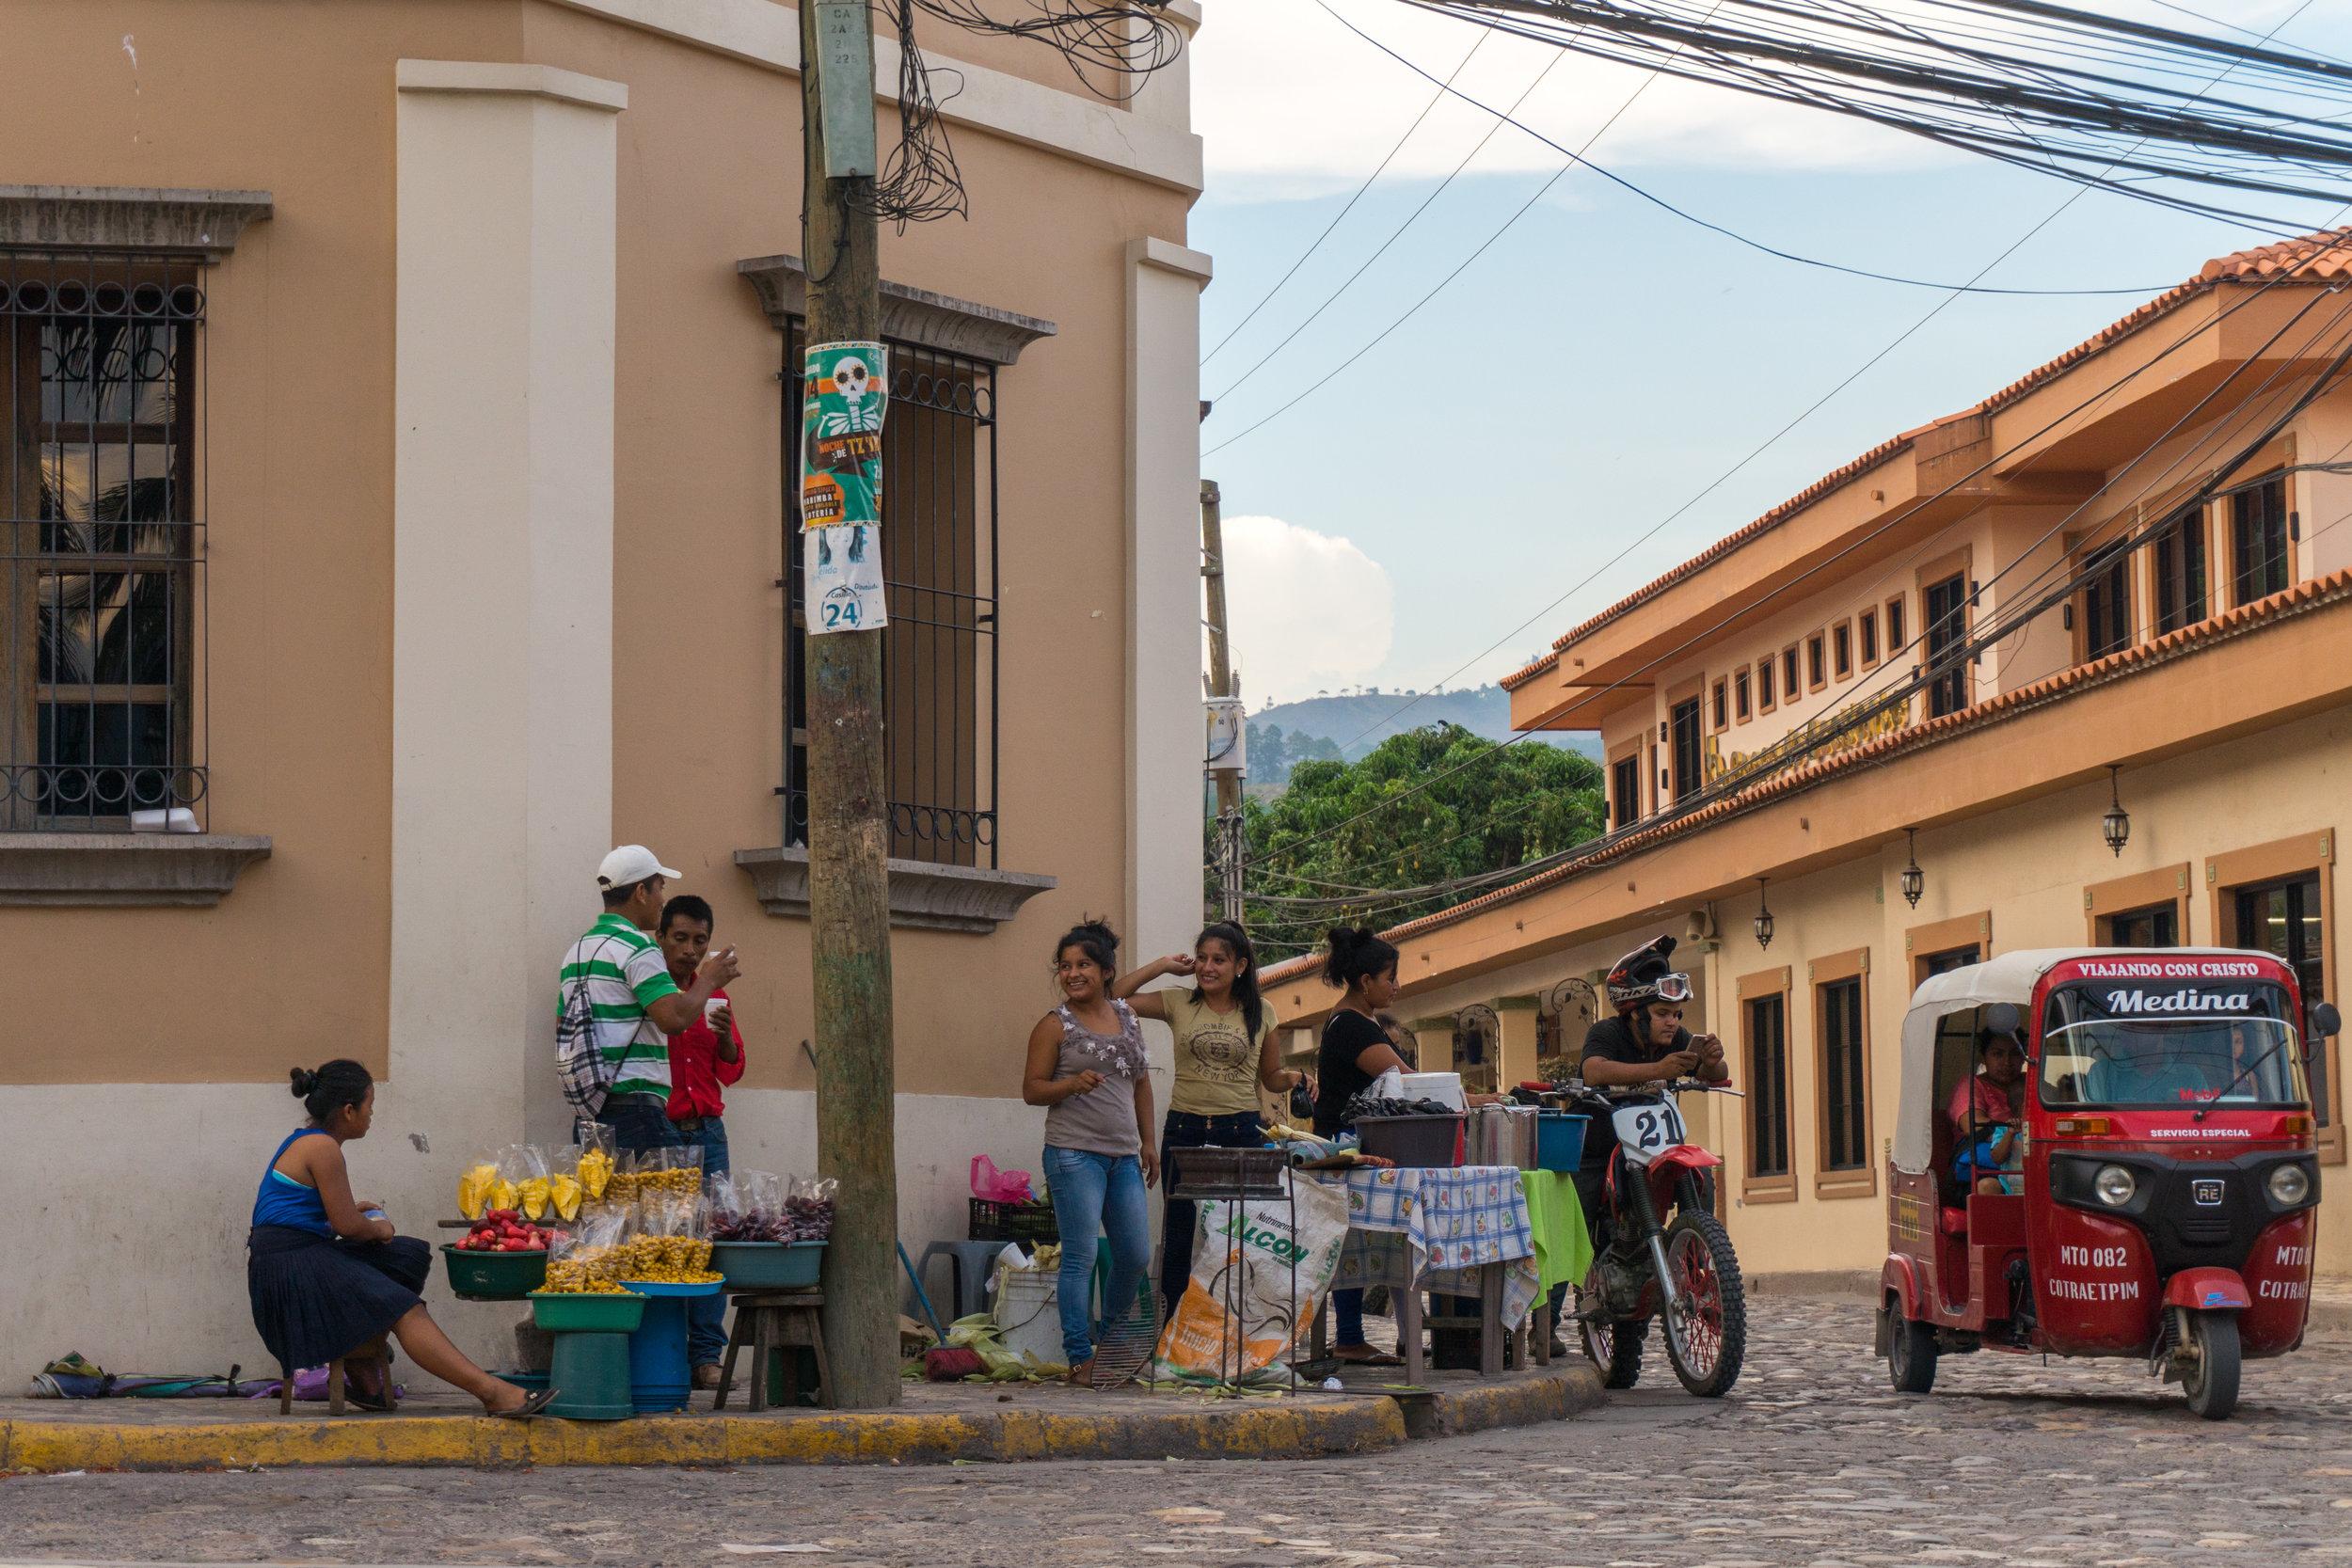 Honduras travel visit honduras Air Water or Land Angel Verde AWOL TV TRAVEL SHOW - copan ruins copán ruinas